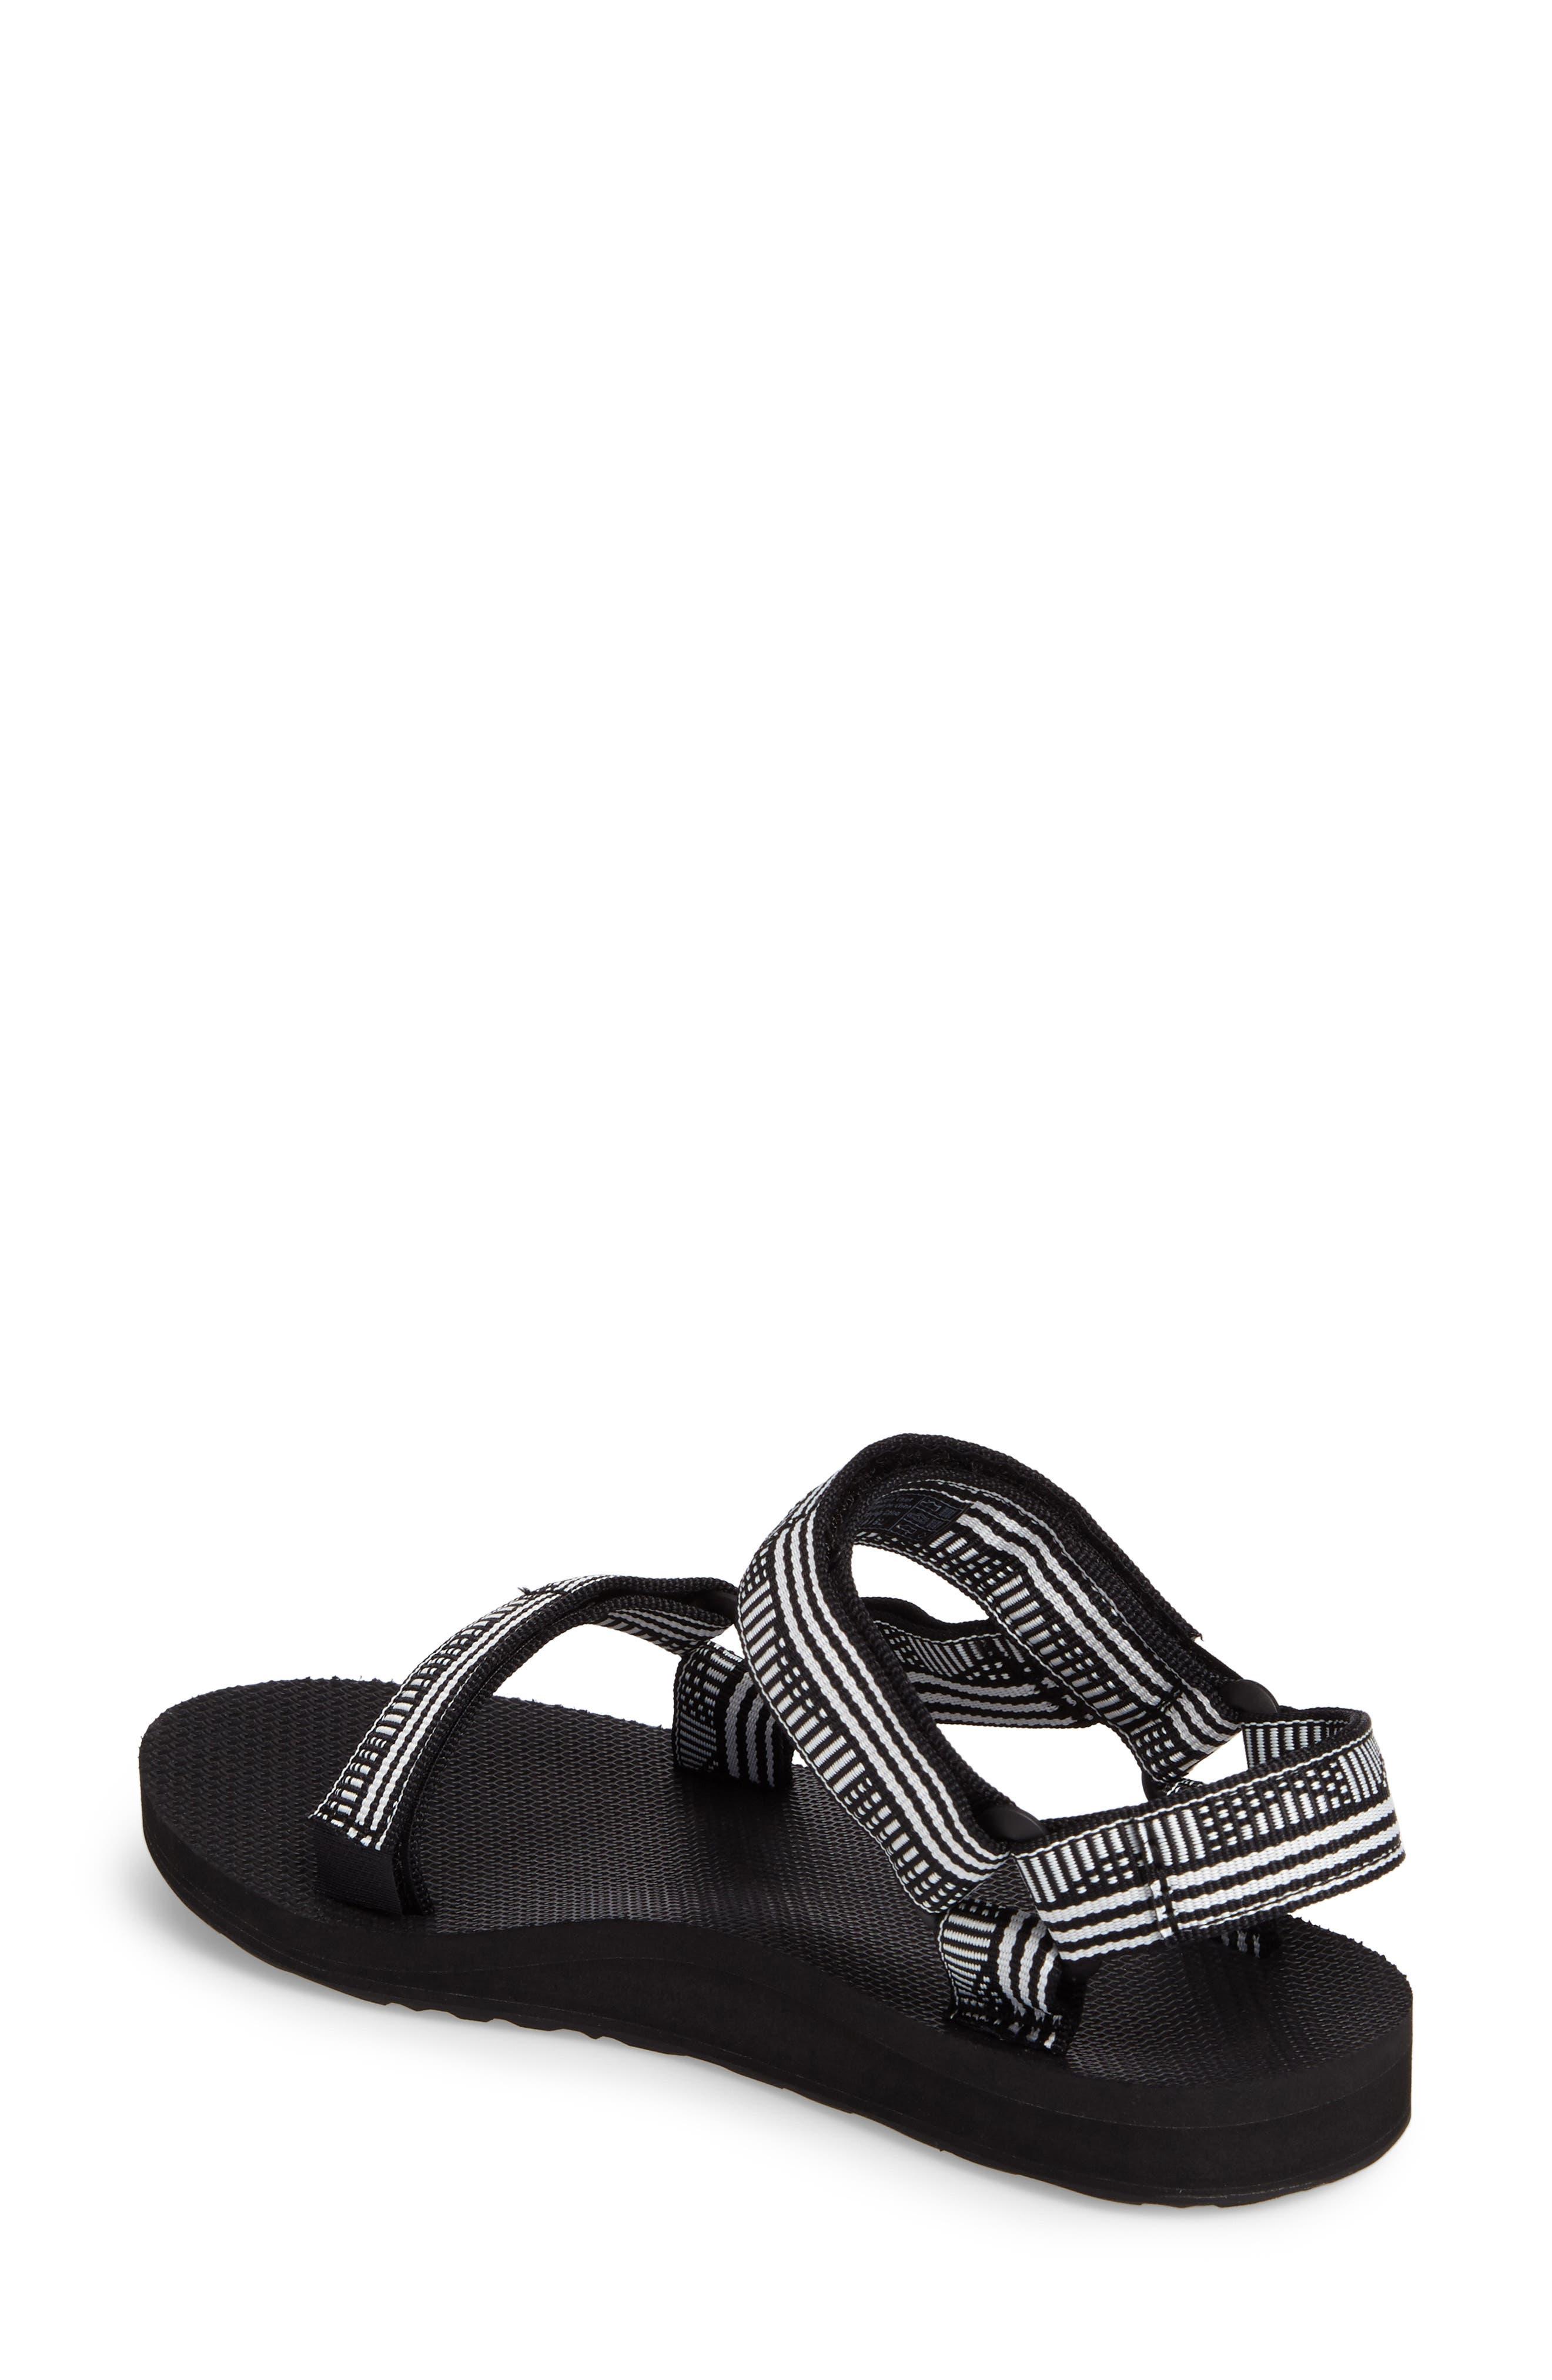 Alternate Image 2  - Teva 'Original Universal' Sandal (Women)